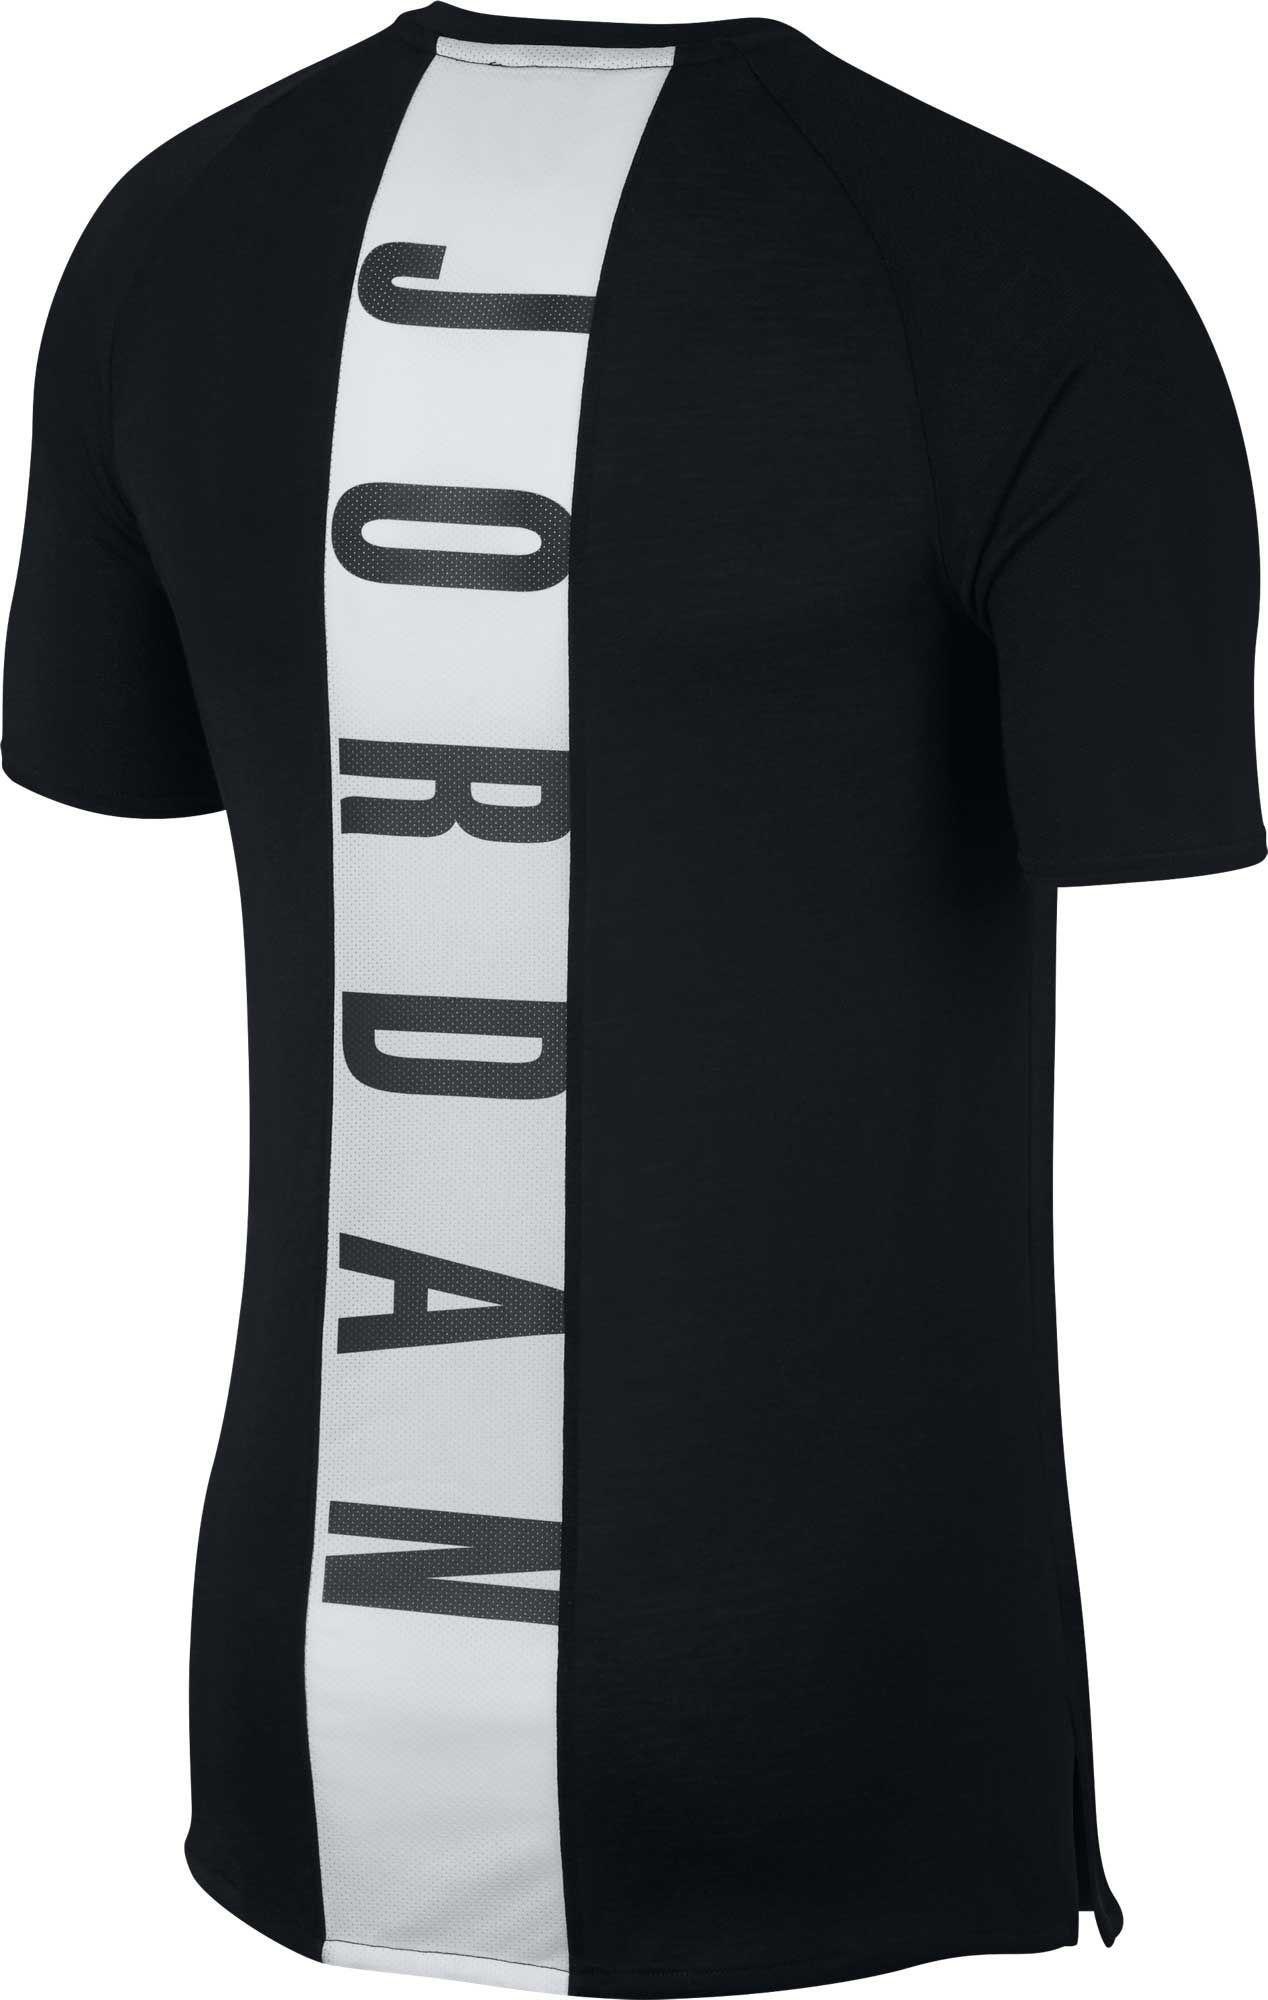 d0ec7ca7 Nike - Black Dry 23 Alpha Training T-shirt for Men - Lyst. View fullscreen